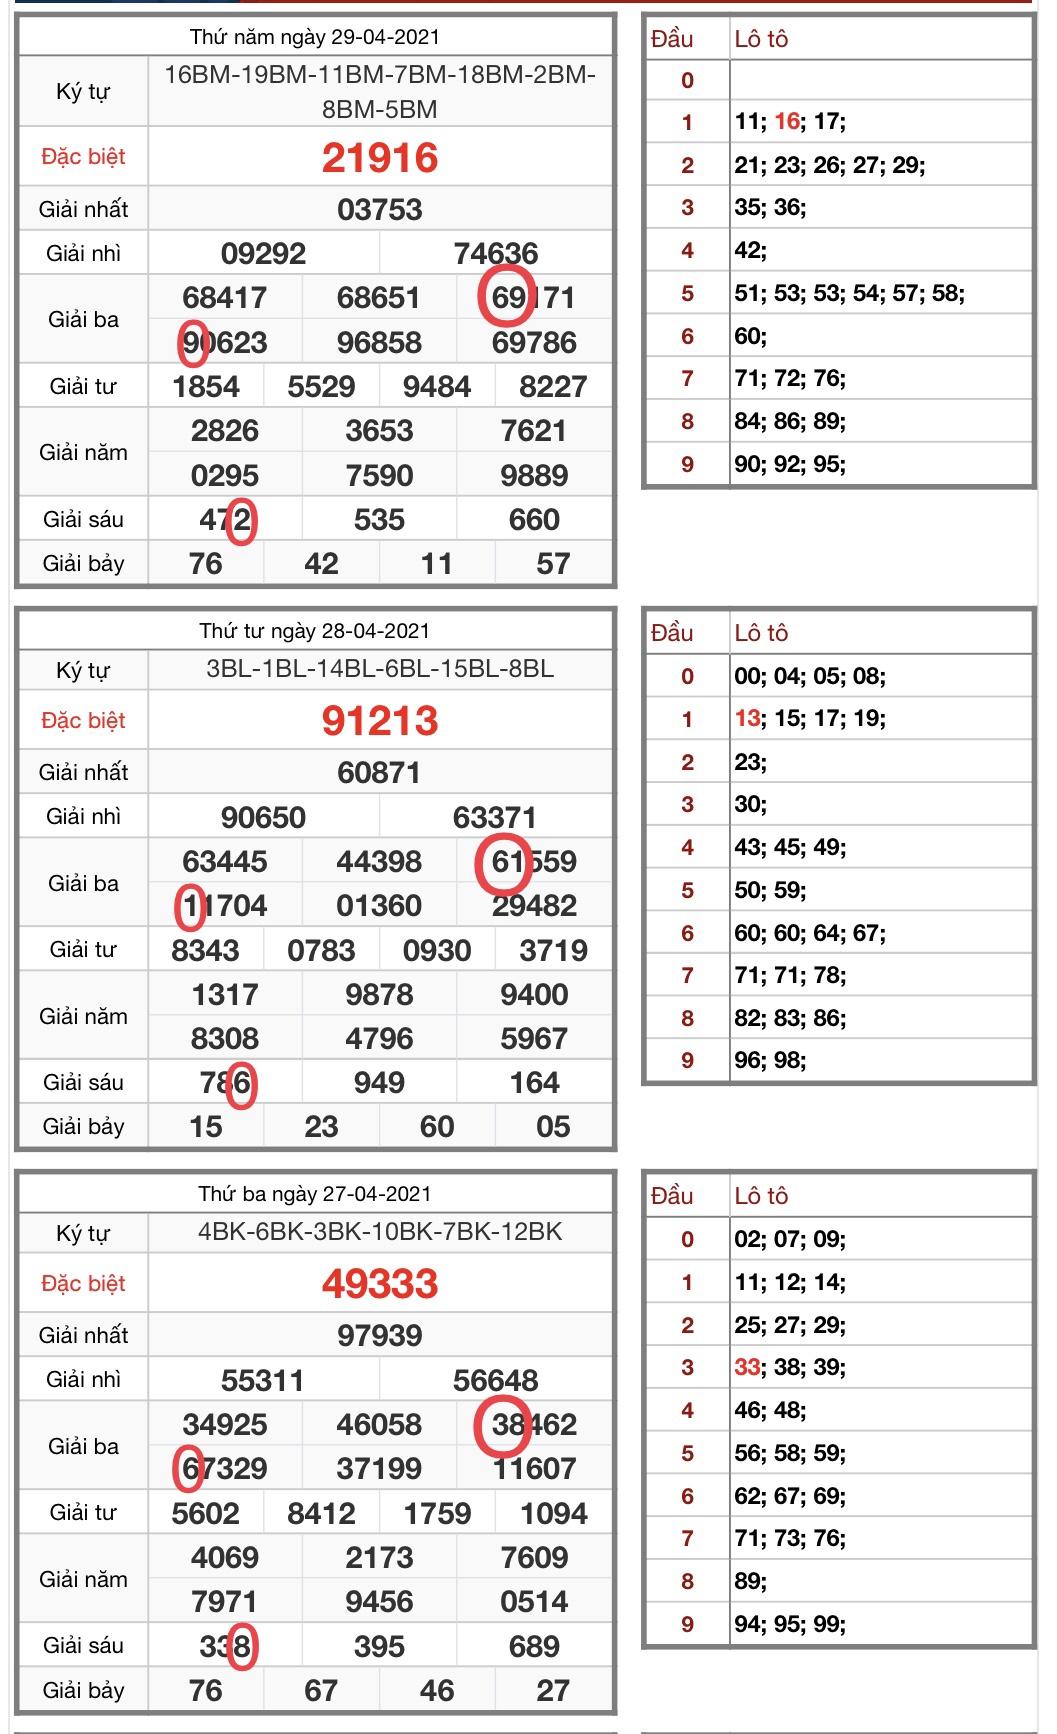 E0C1C84E-D4C2-4BF0-9A4F-570D5FD8D264.jpeg